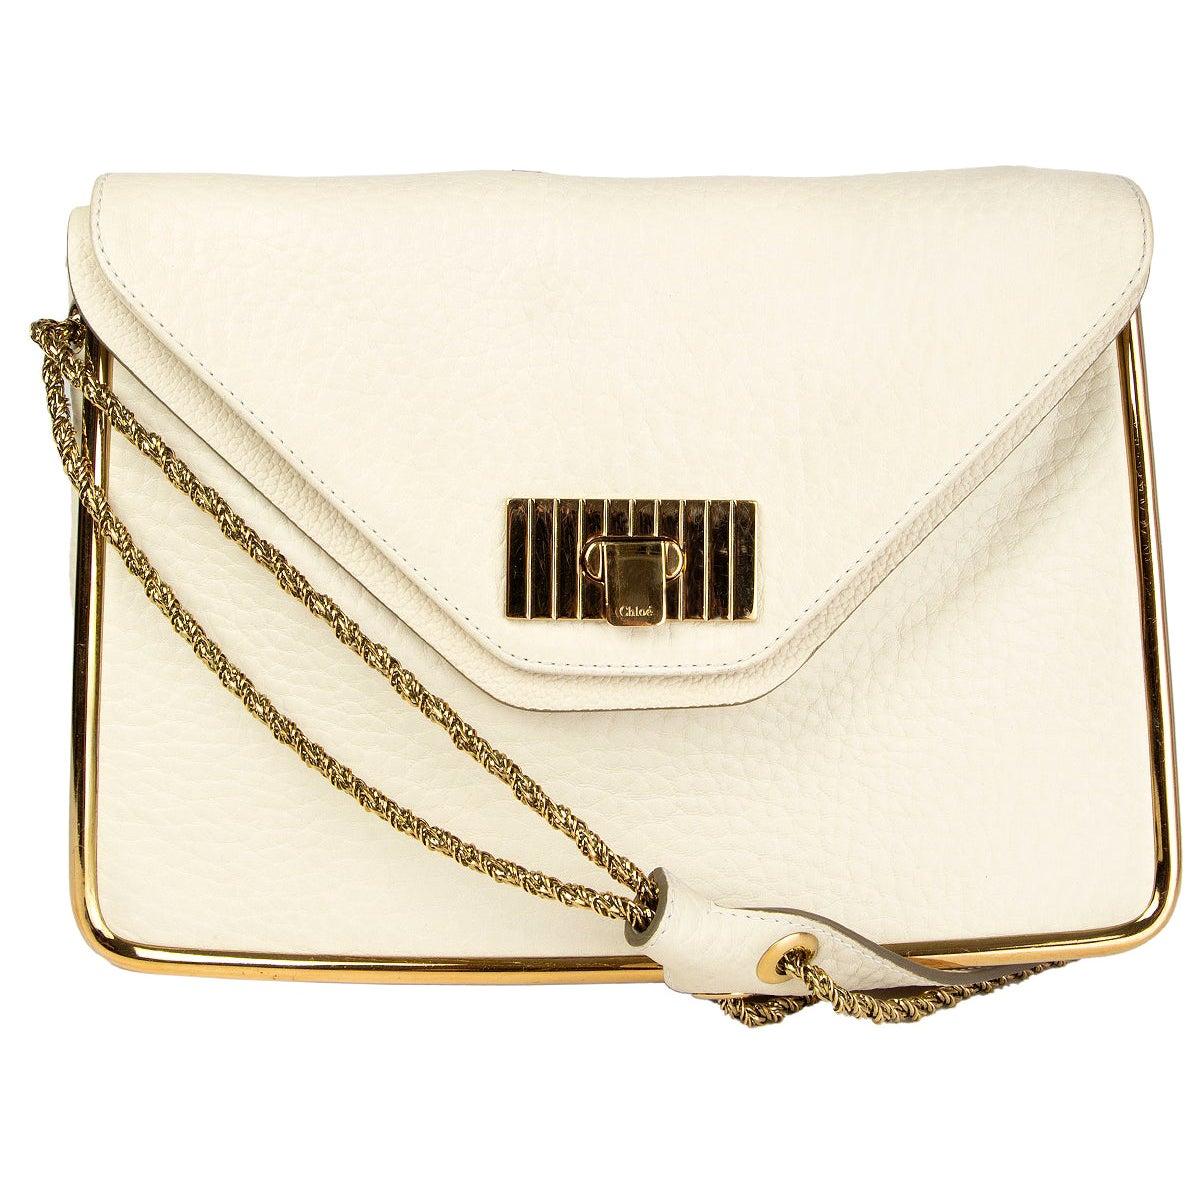 CHLOE white leather MILK SALLY MEDIUM Shoulder Bag